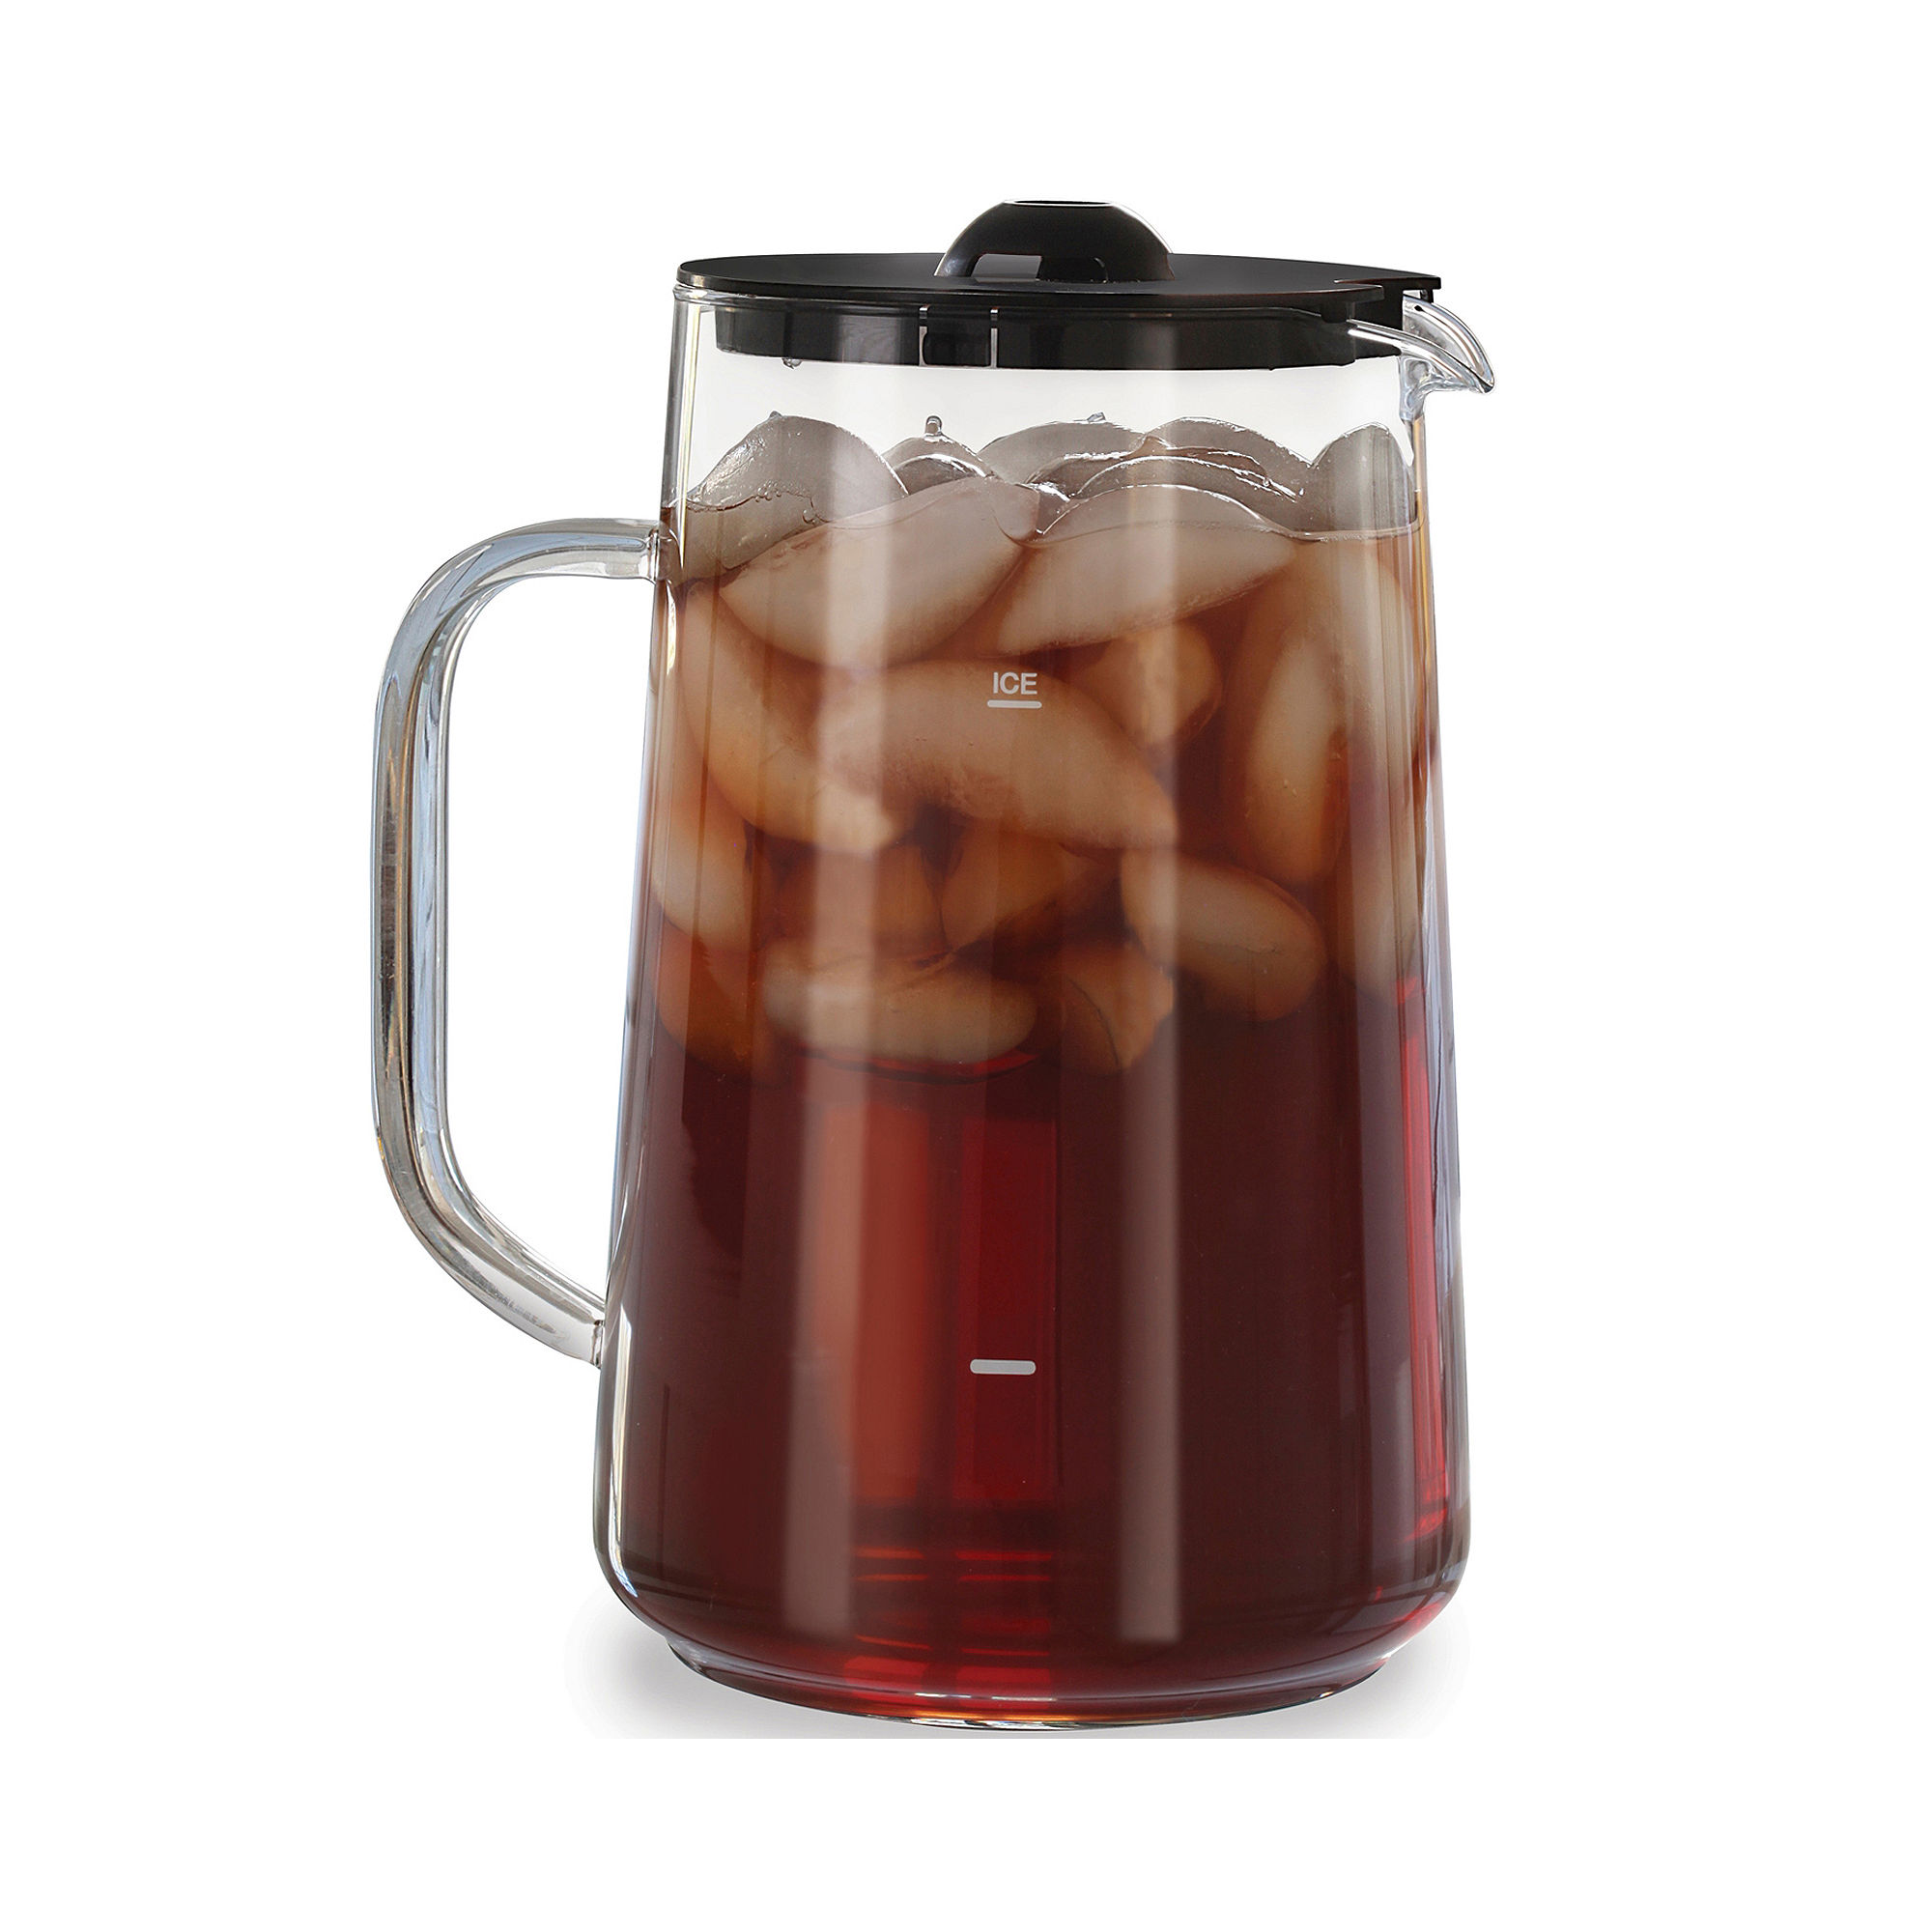 Capresso 80-oz. Glass Iced Tea Pitcher